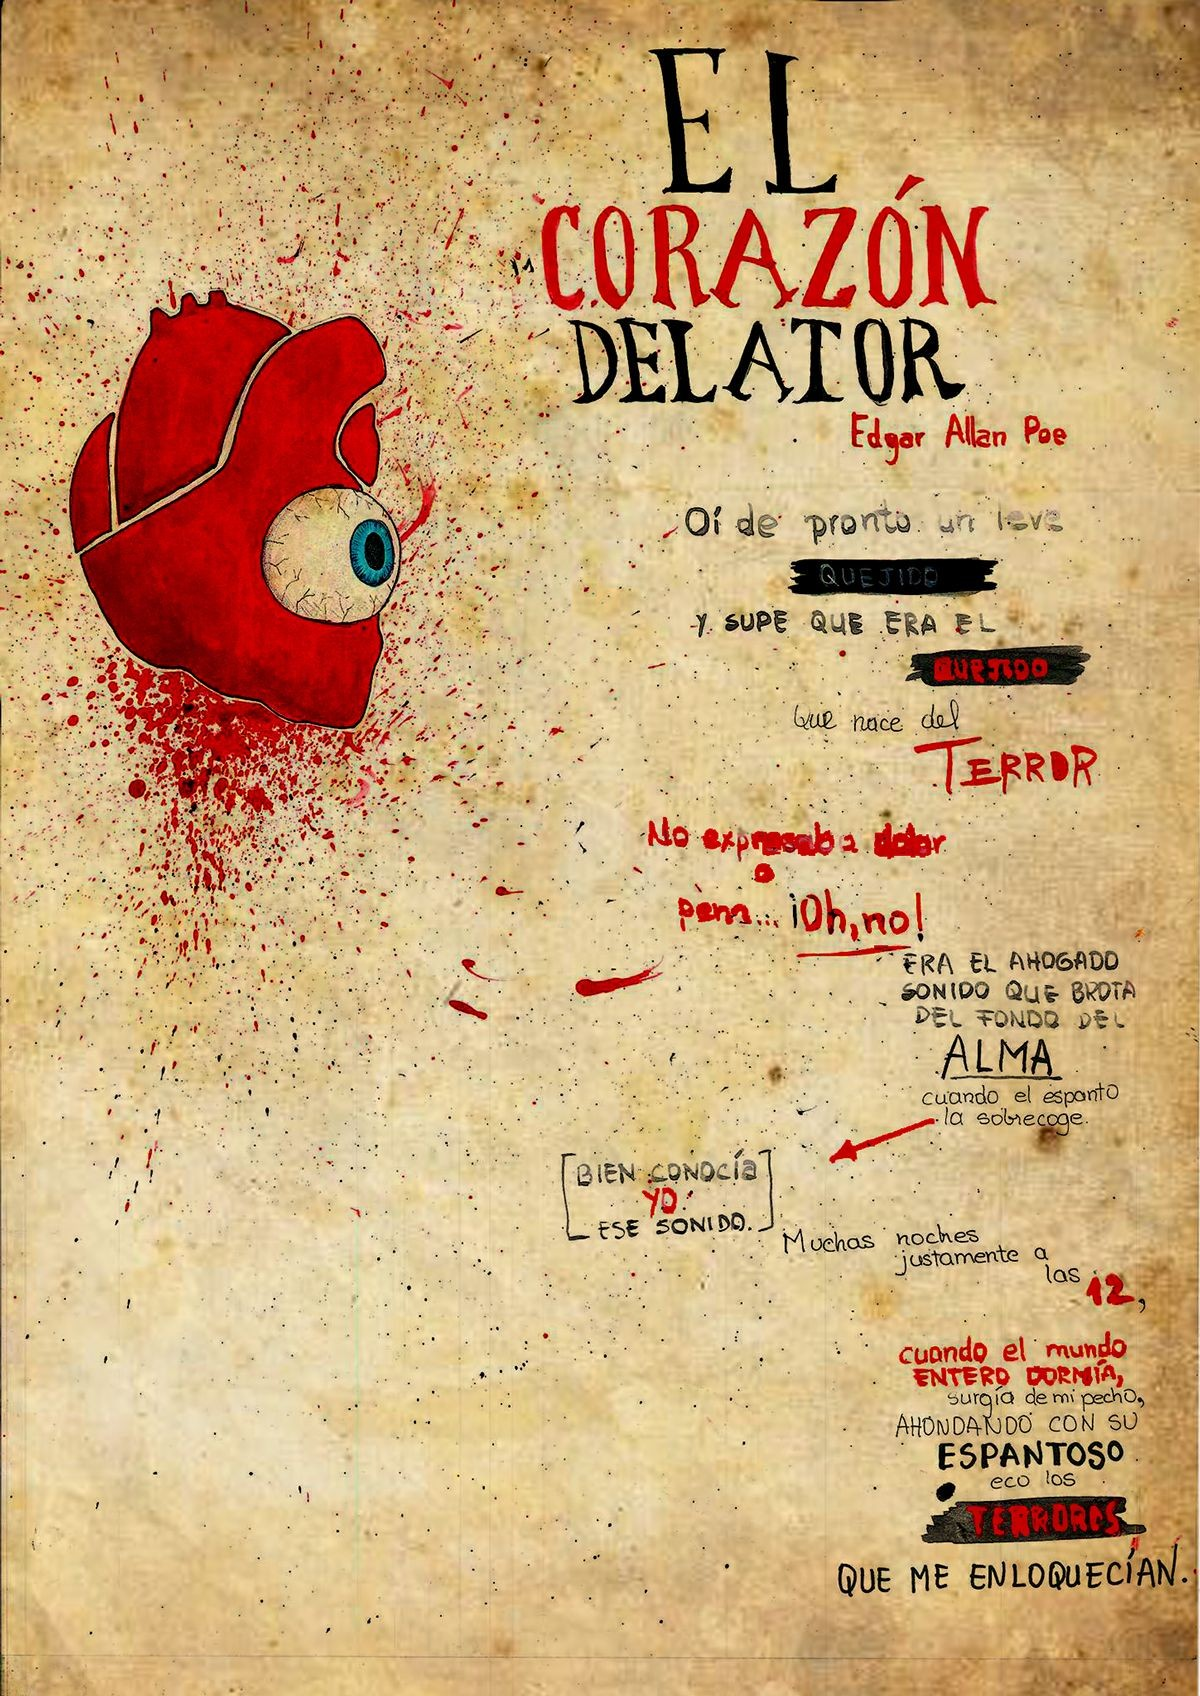 El coraz³n delator on Behance